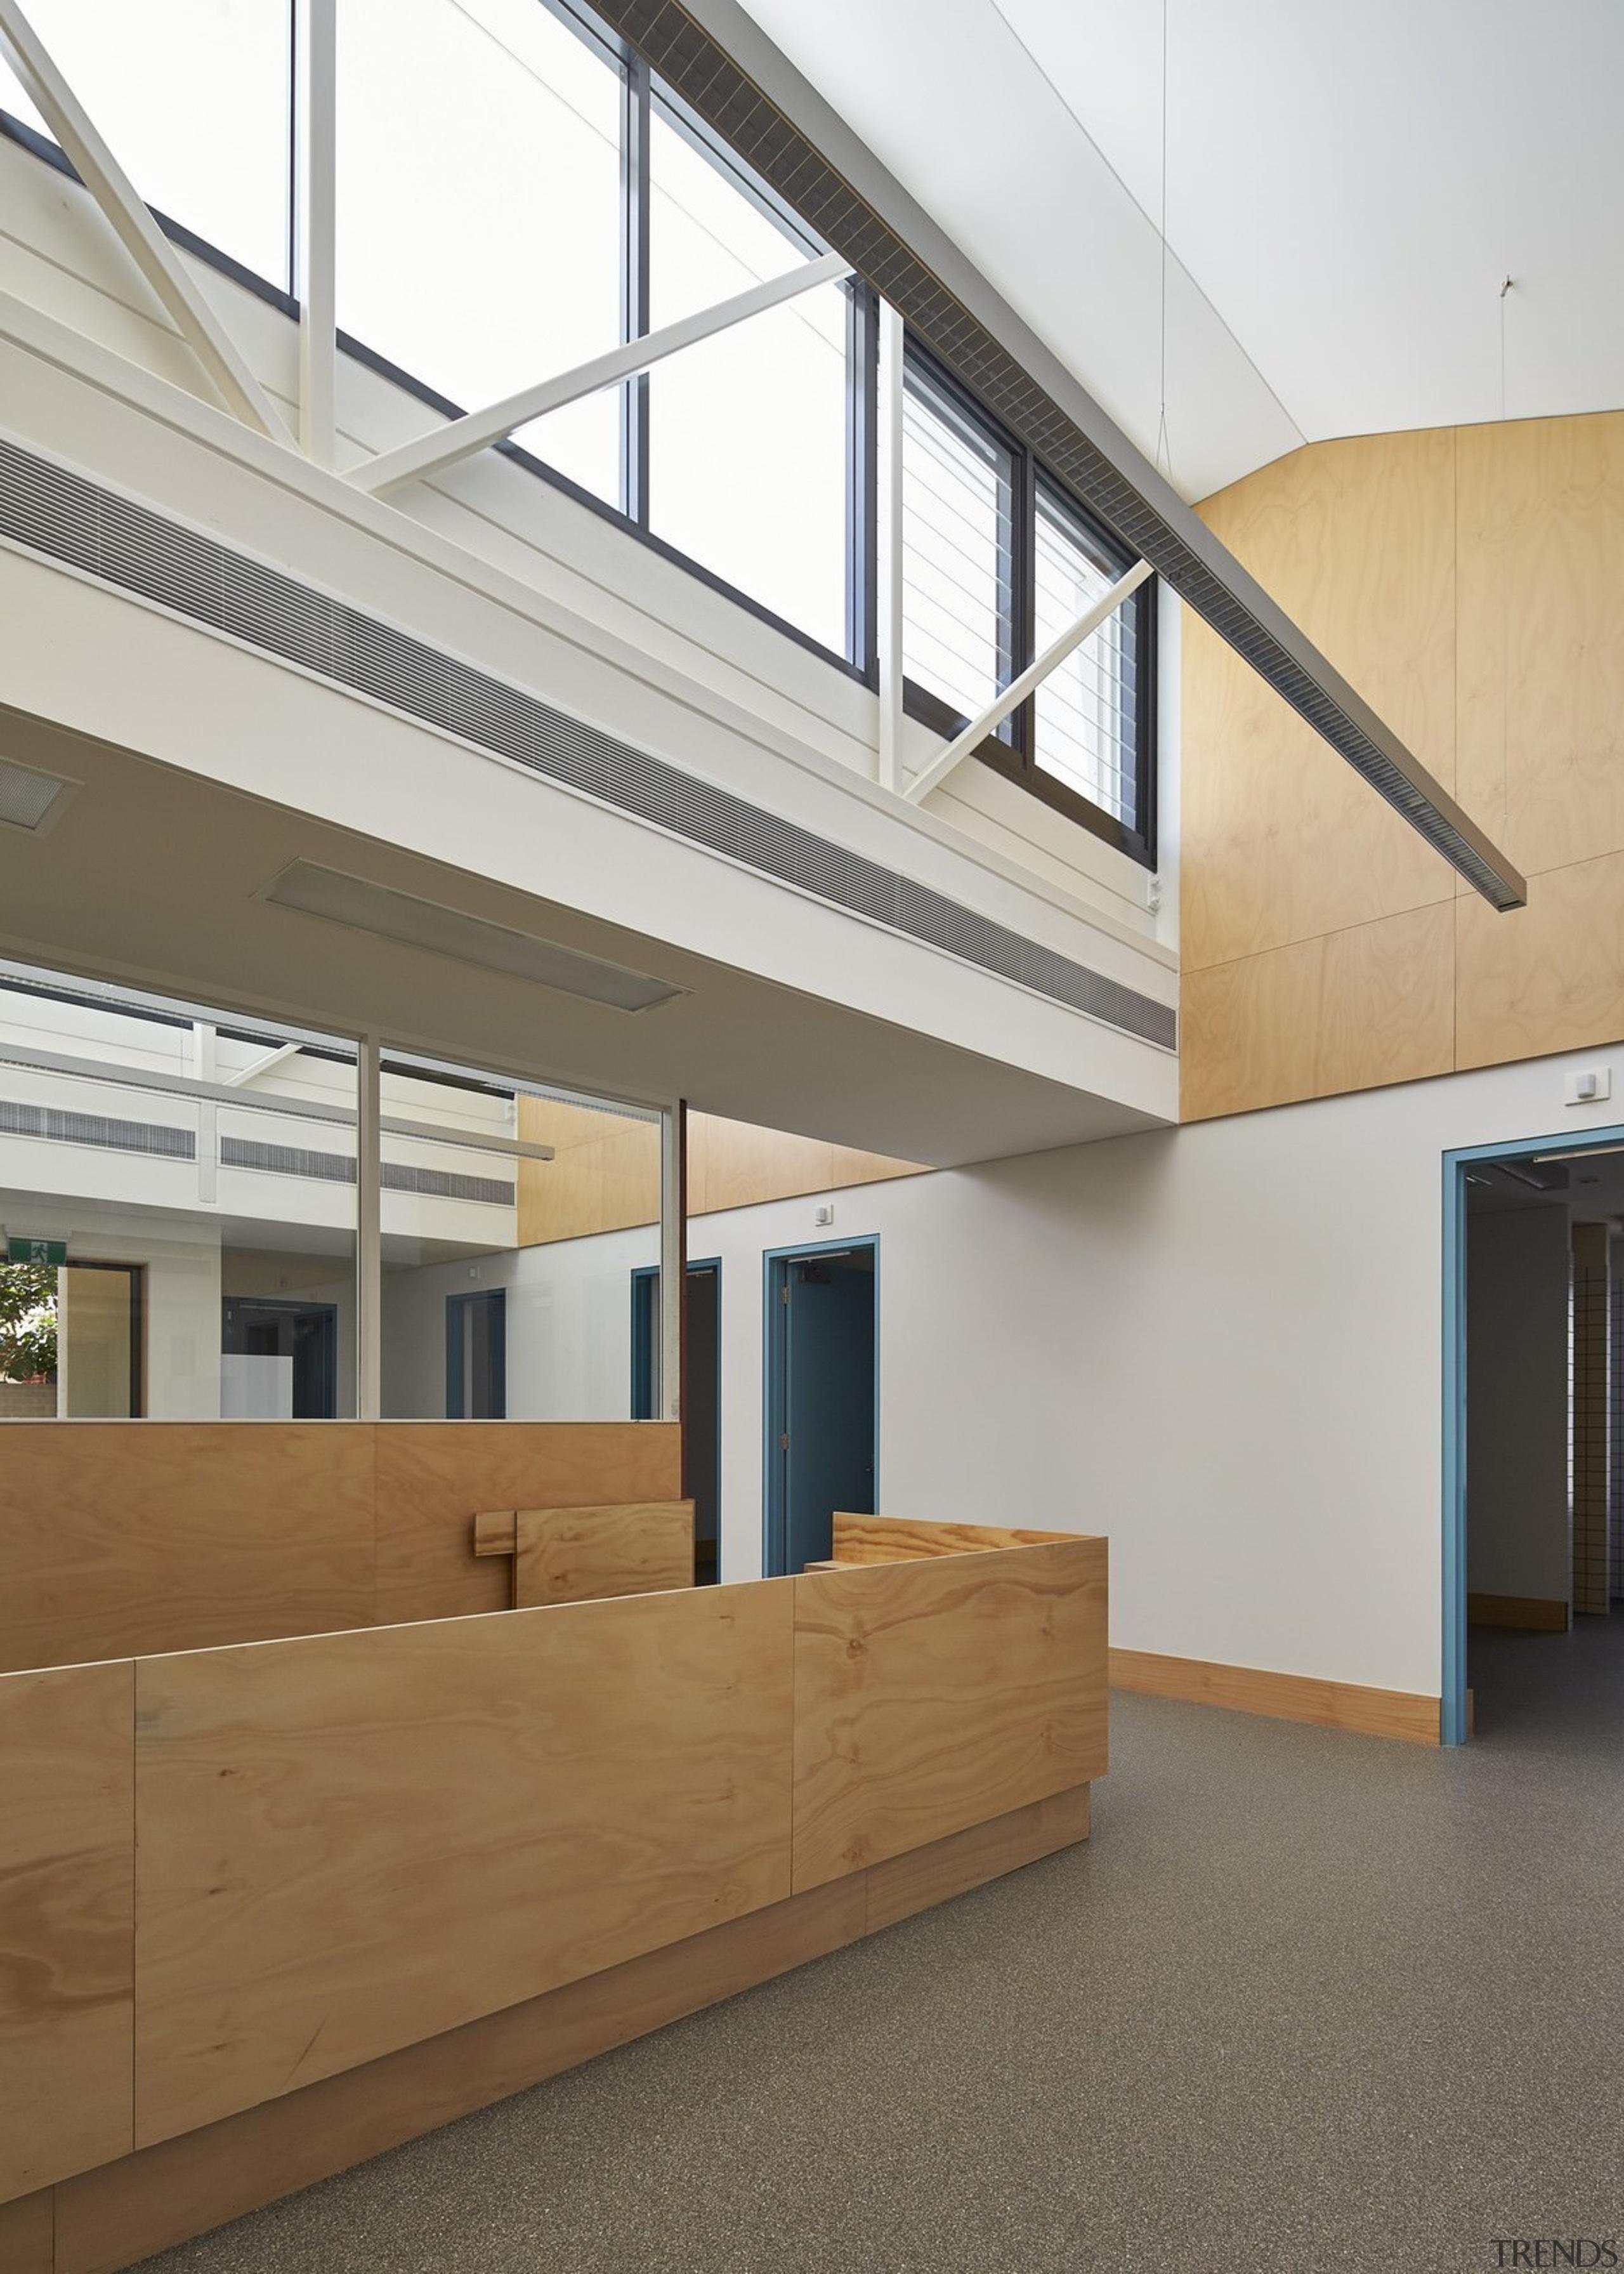 Tom Fisher House - Tom Fisher House - architecture, daylighting, floor, house, interior design, lobby, window, gray